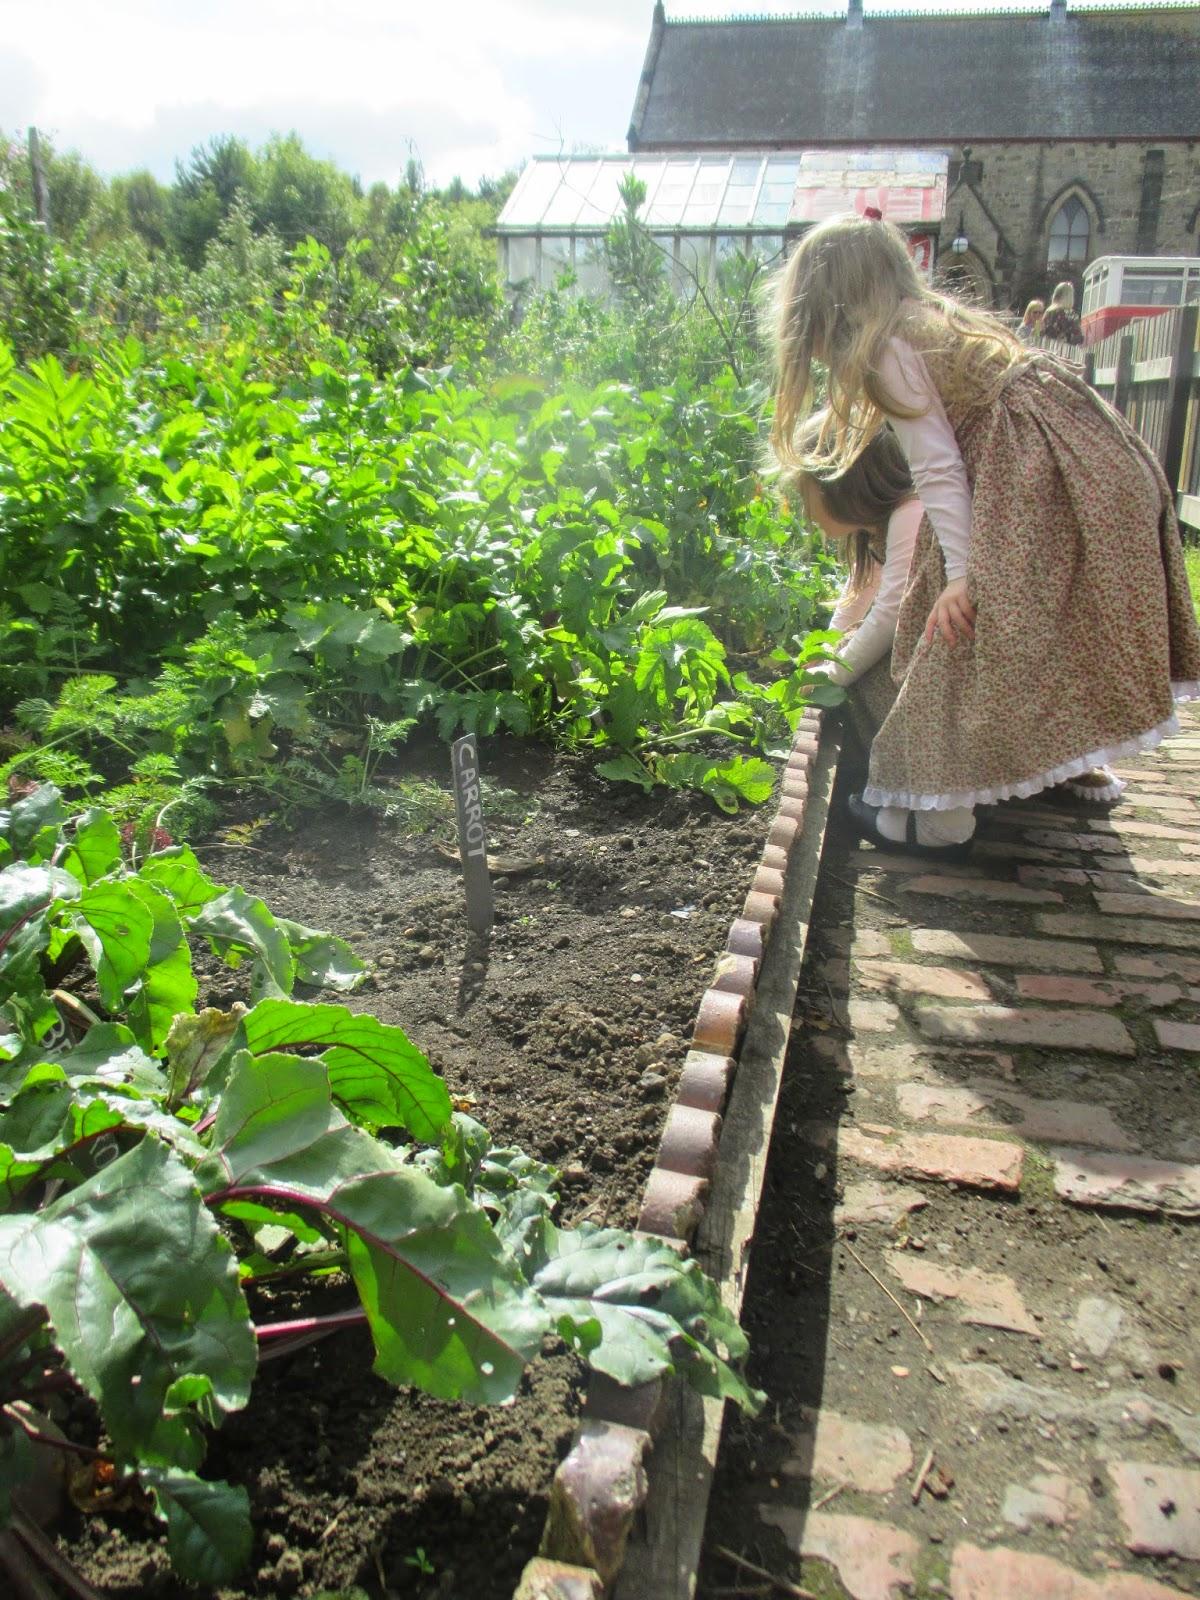 Wartime Kitchen Garden Dvd Remembering The Old Ways 2014 08 31